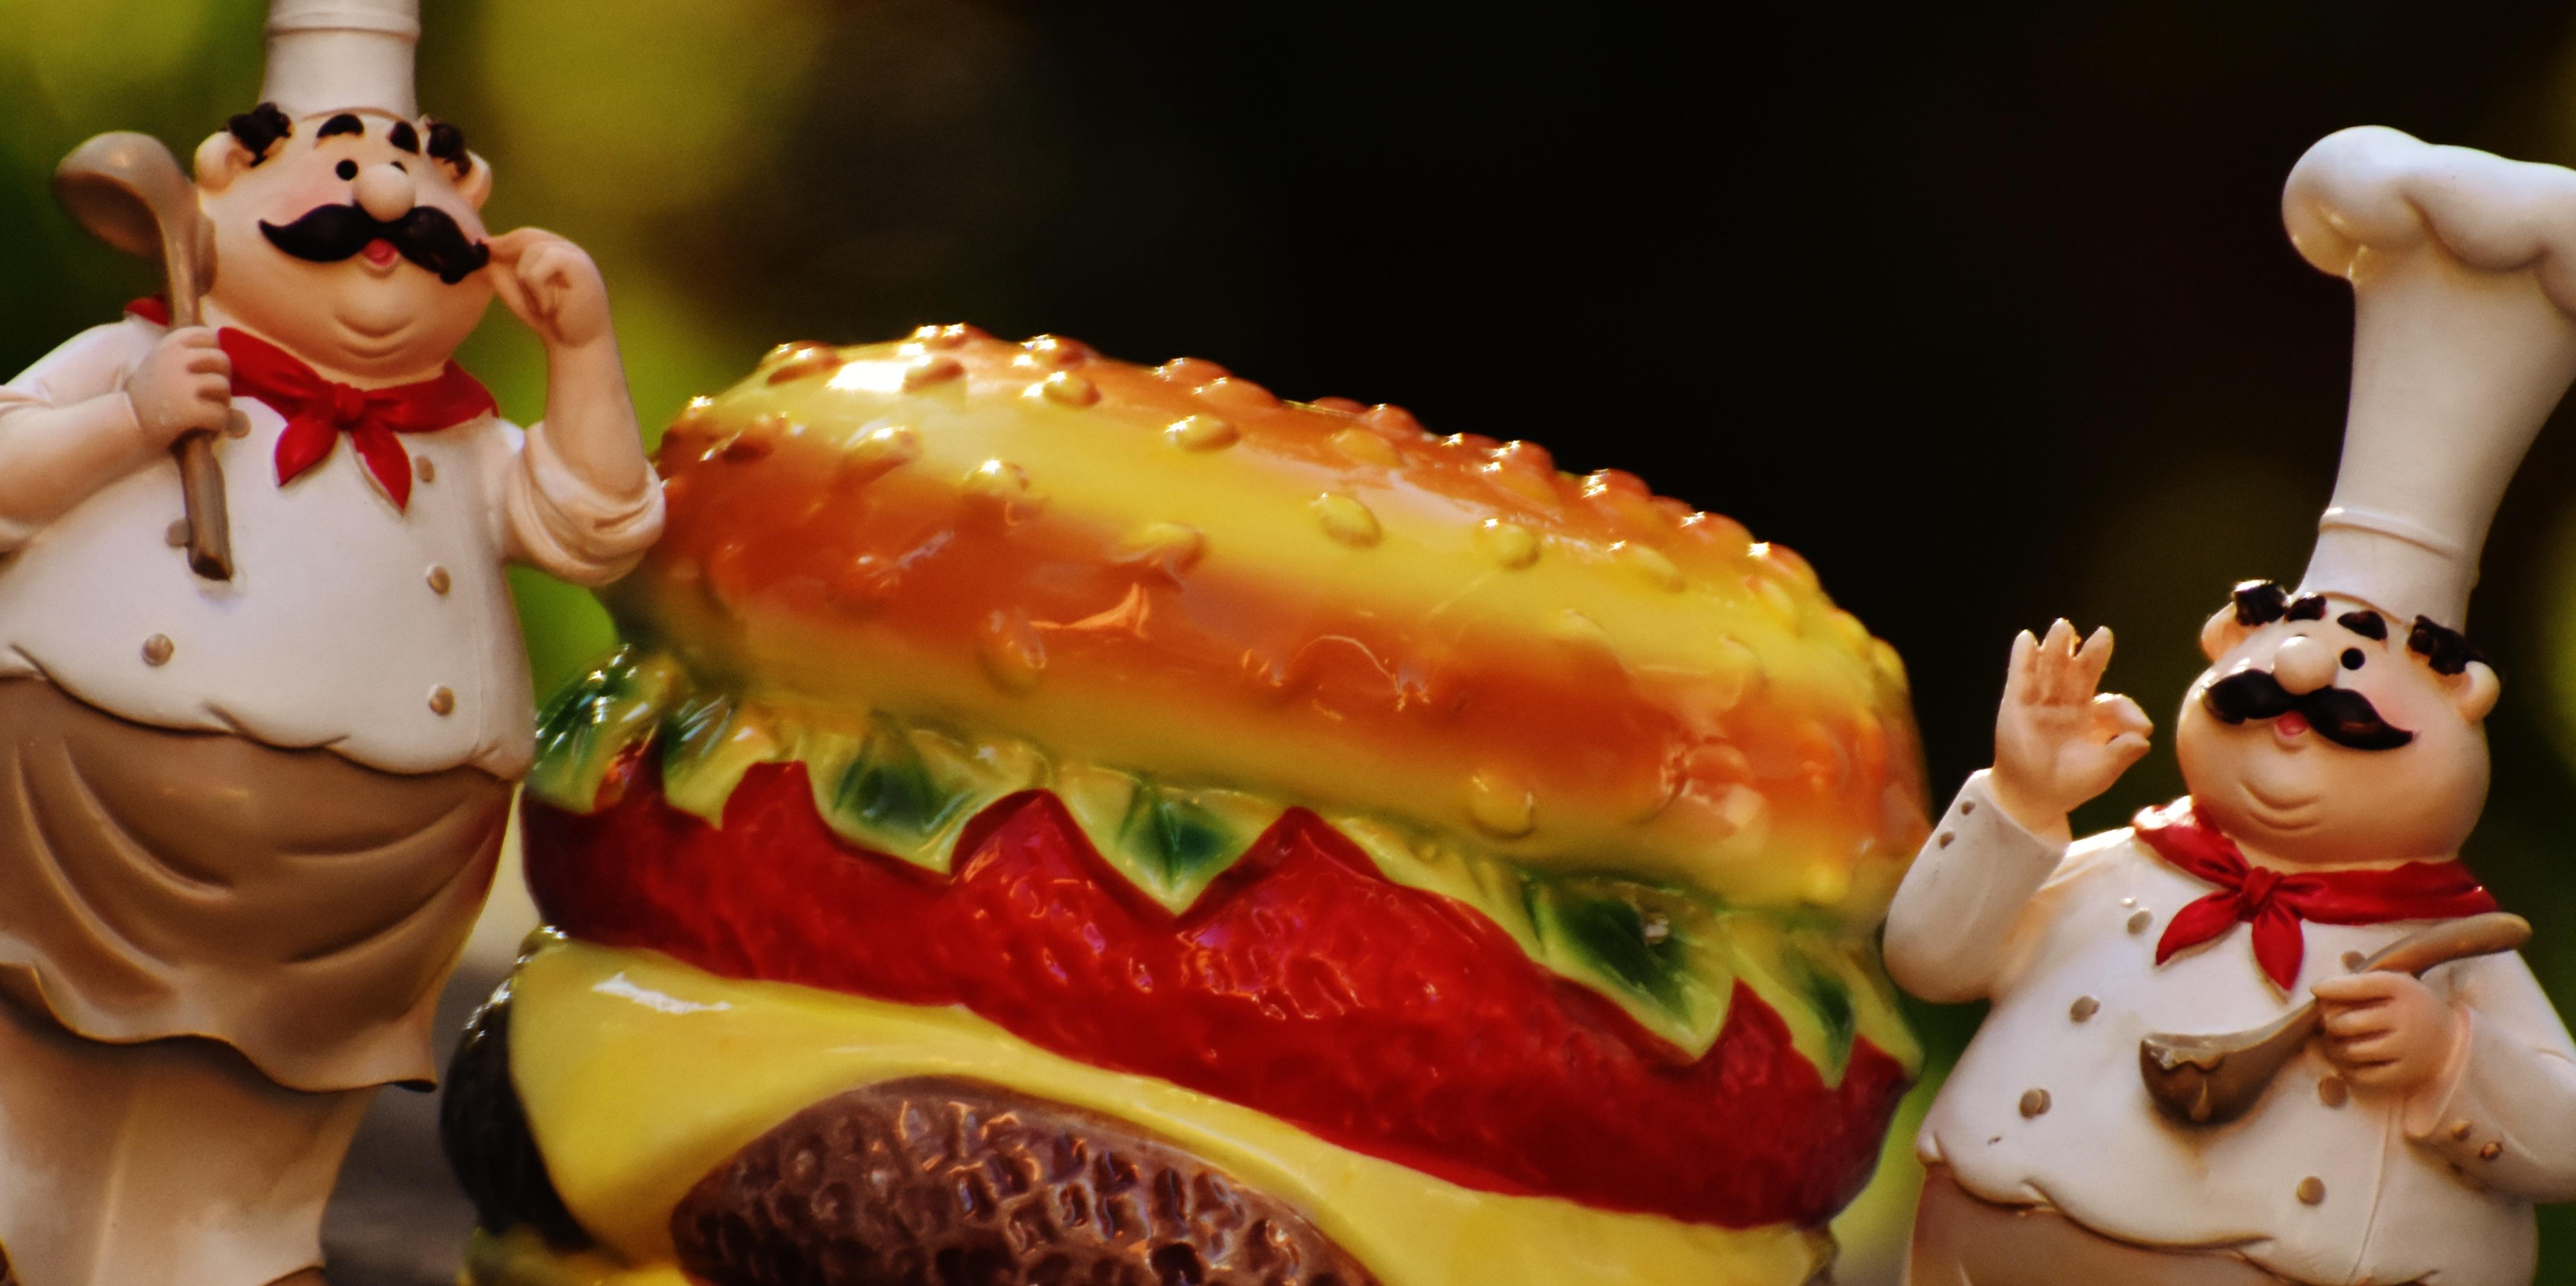 Free Images Restaurant Dish Meal Food Dessert Cuisine